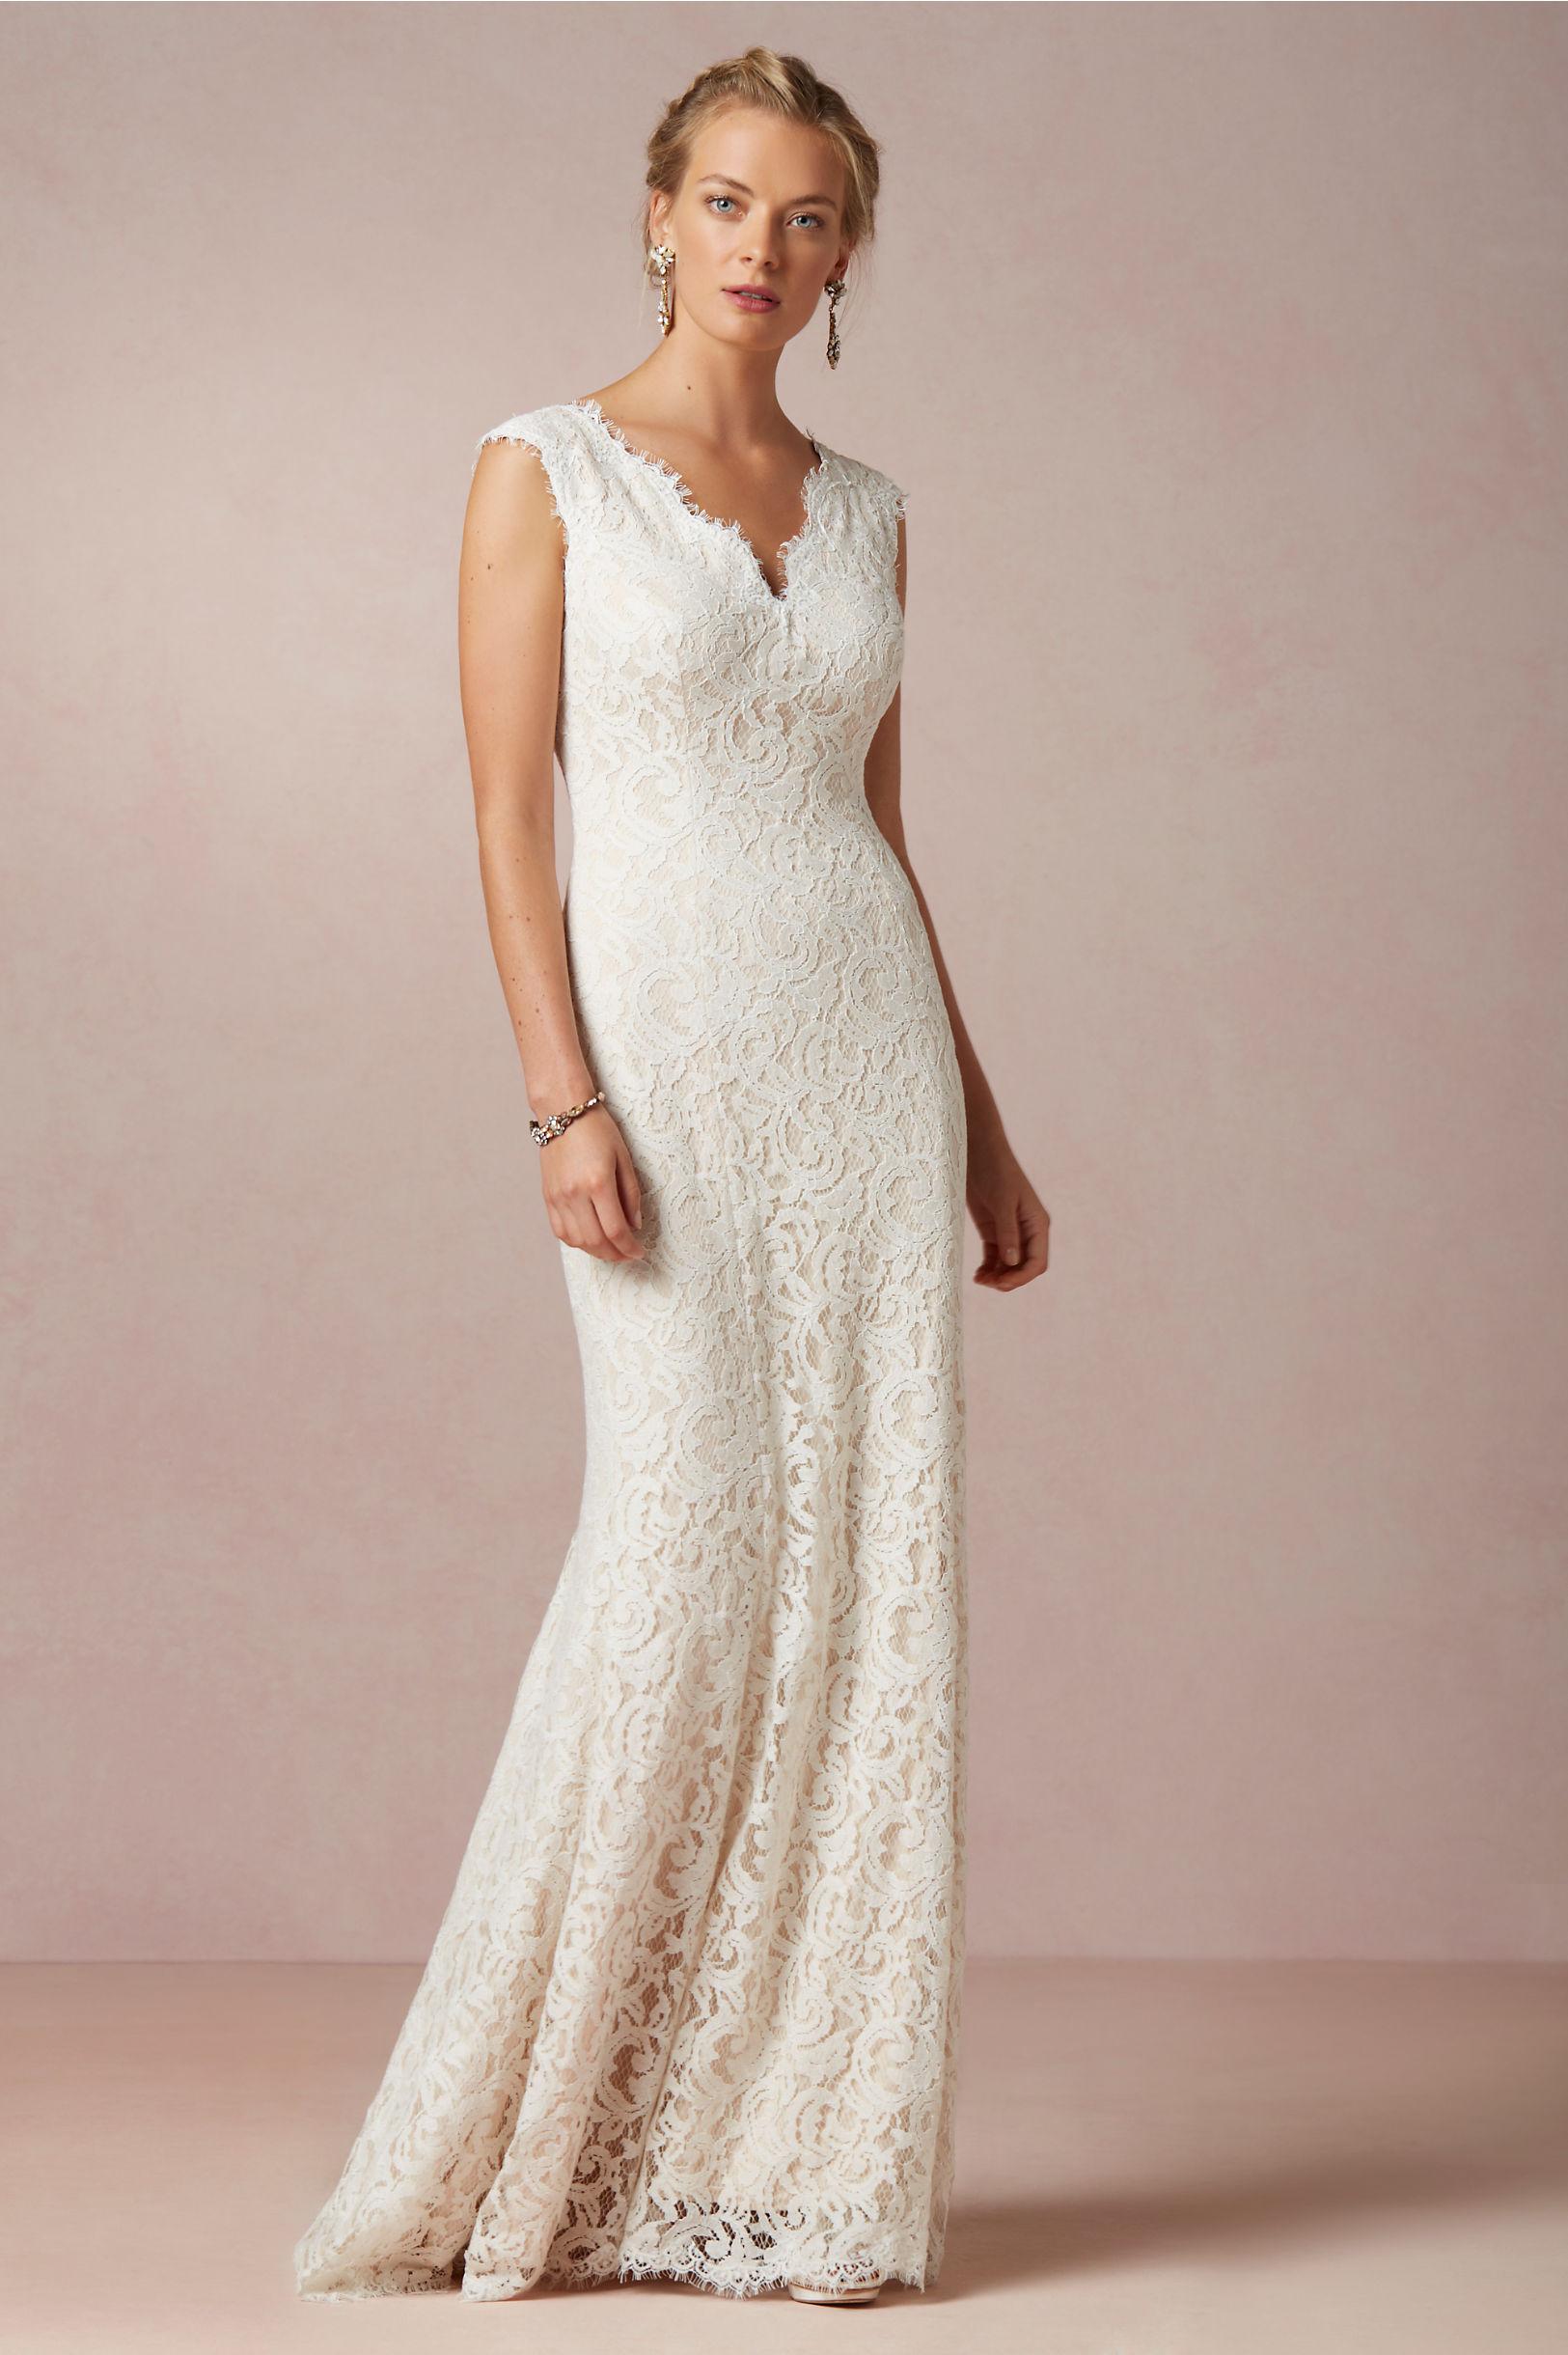 Scalloped V Neck Sheath Lace Pattern Wedding Dress